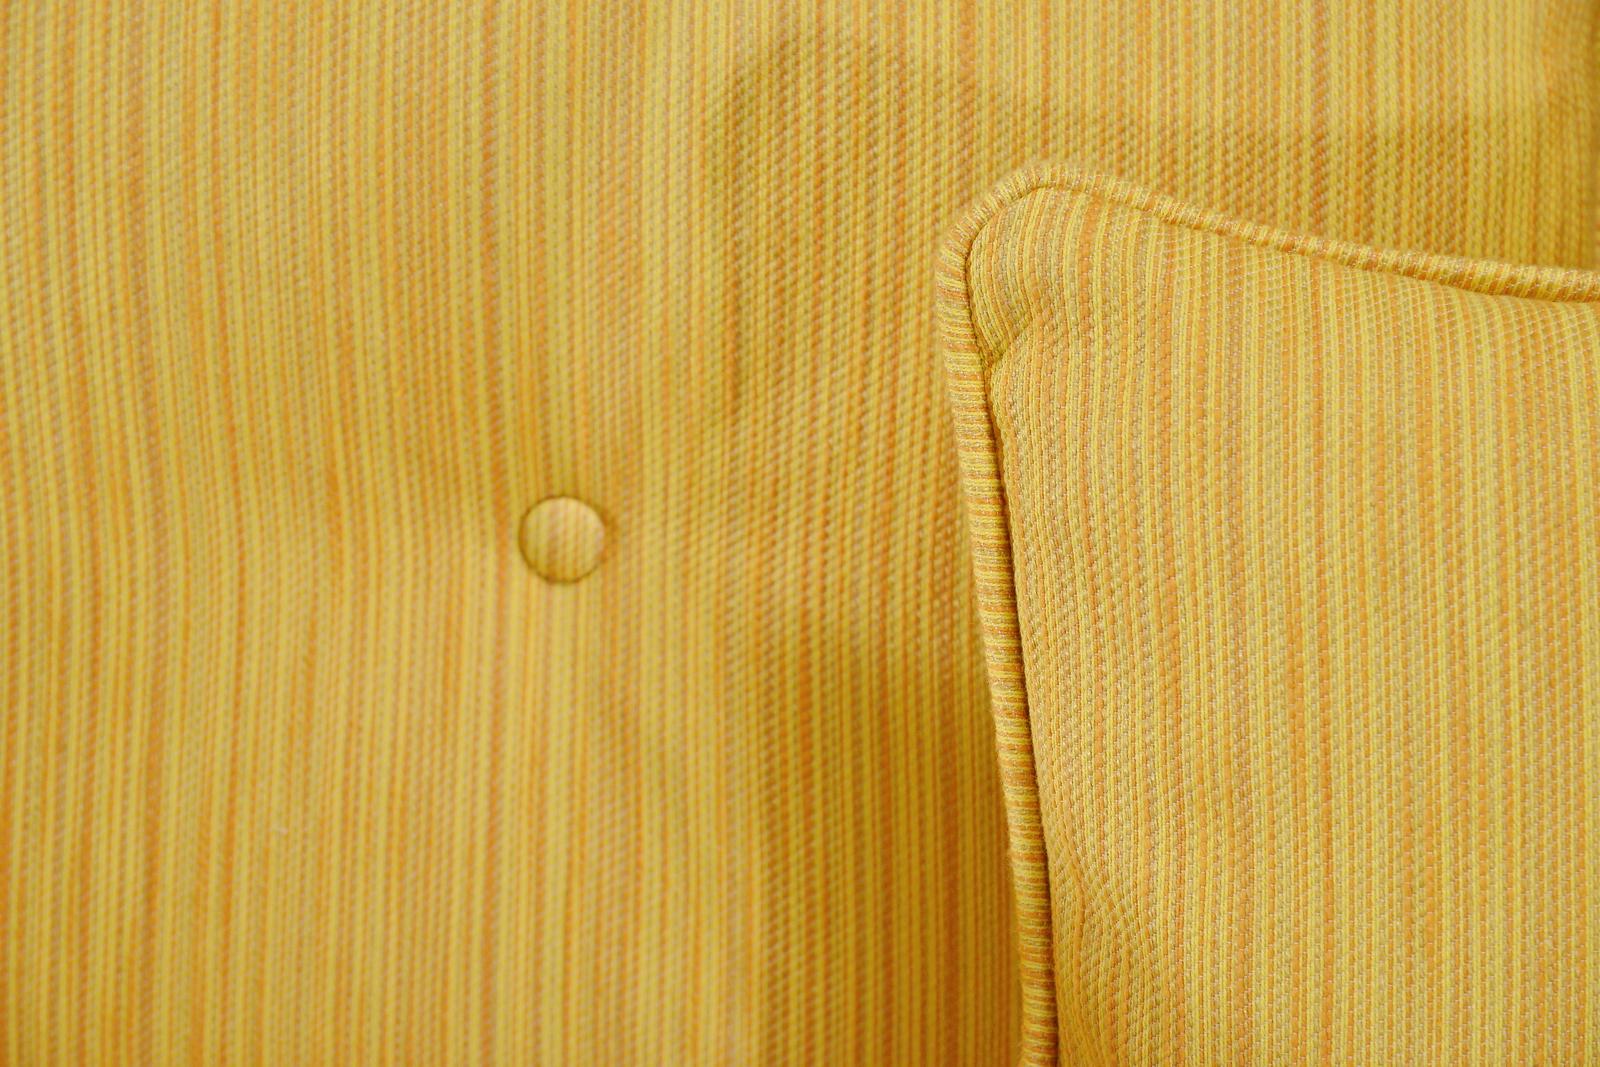 PTendercool-Sofa-PT71-BS1-TE-NO-Dido Yellow Agate-190228-08